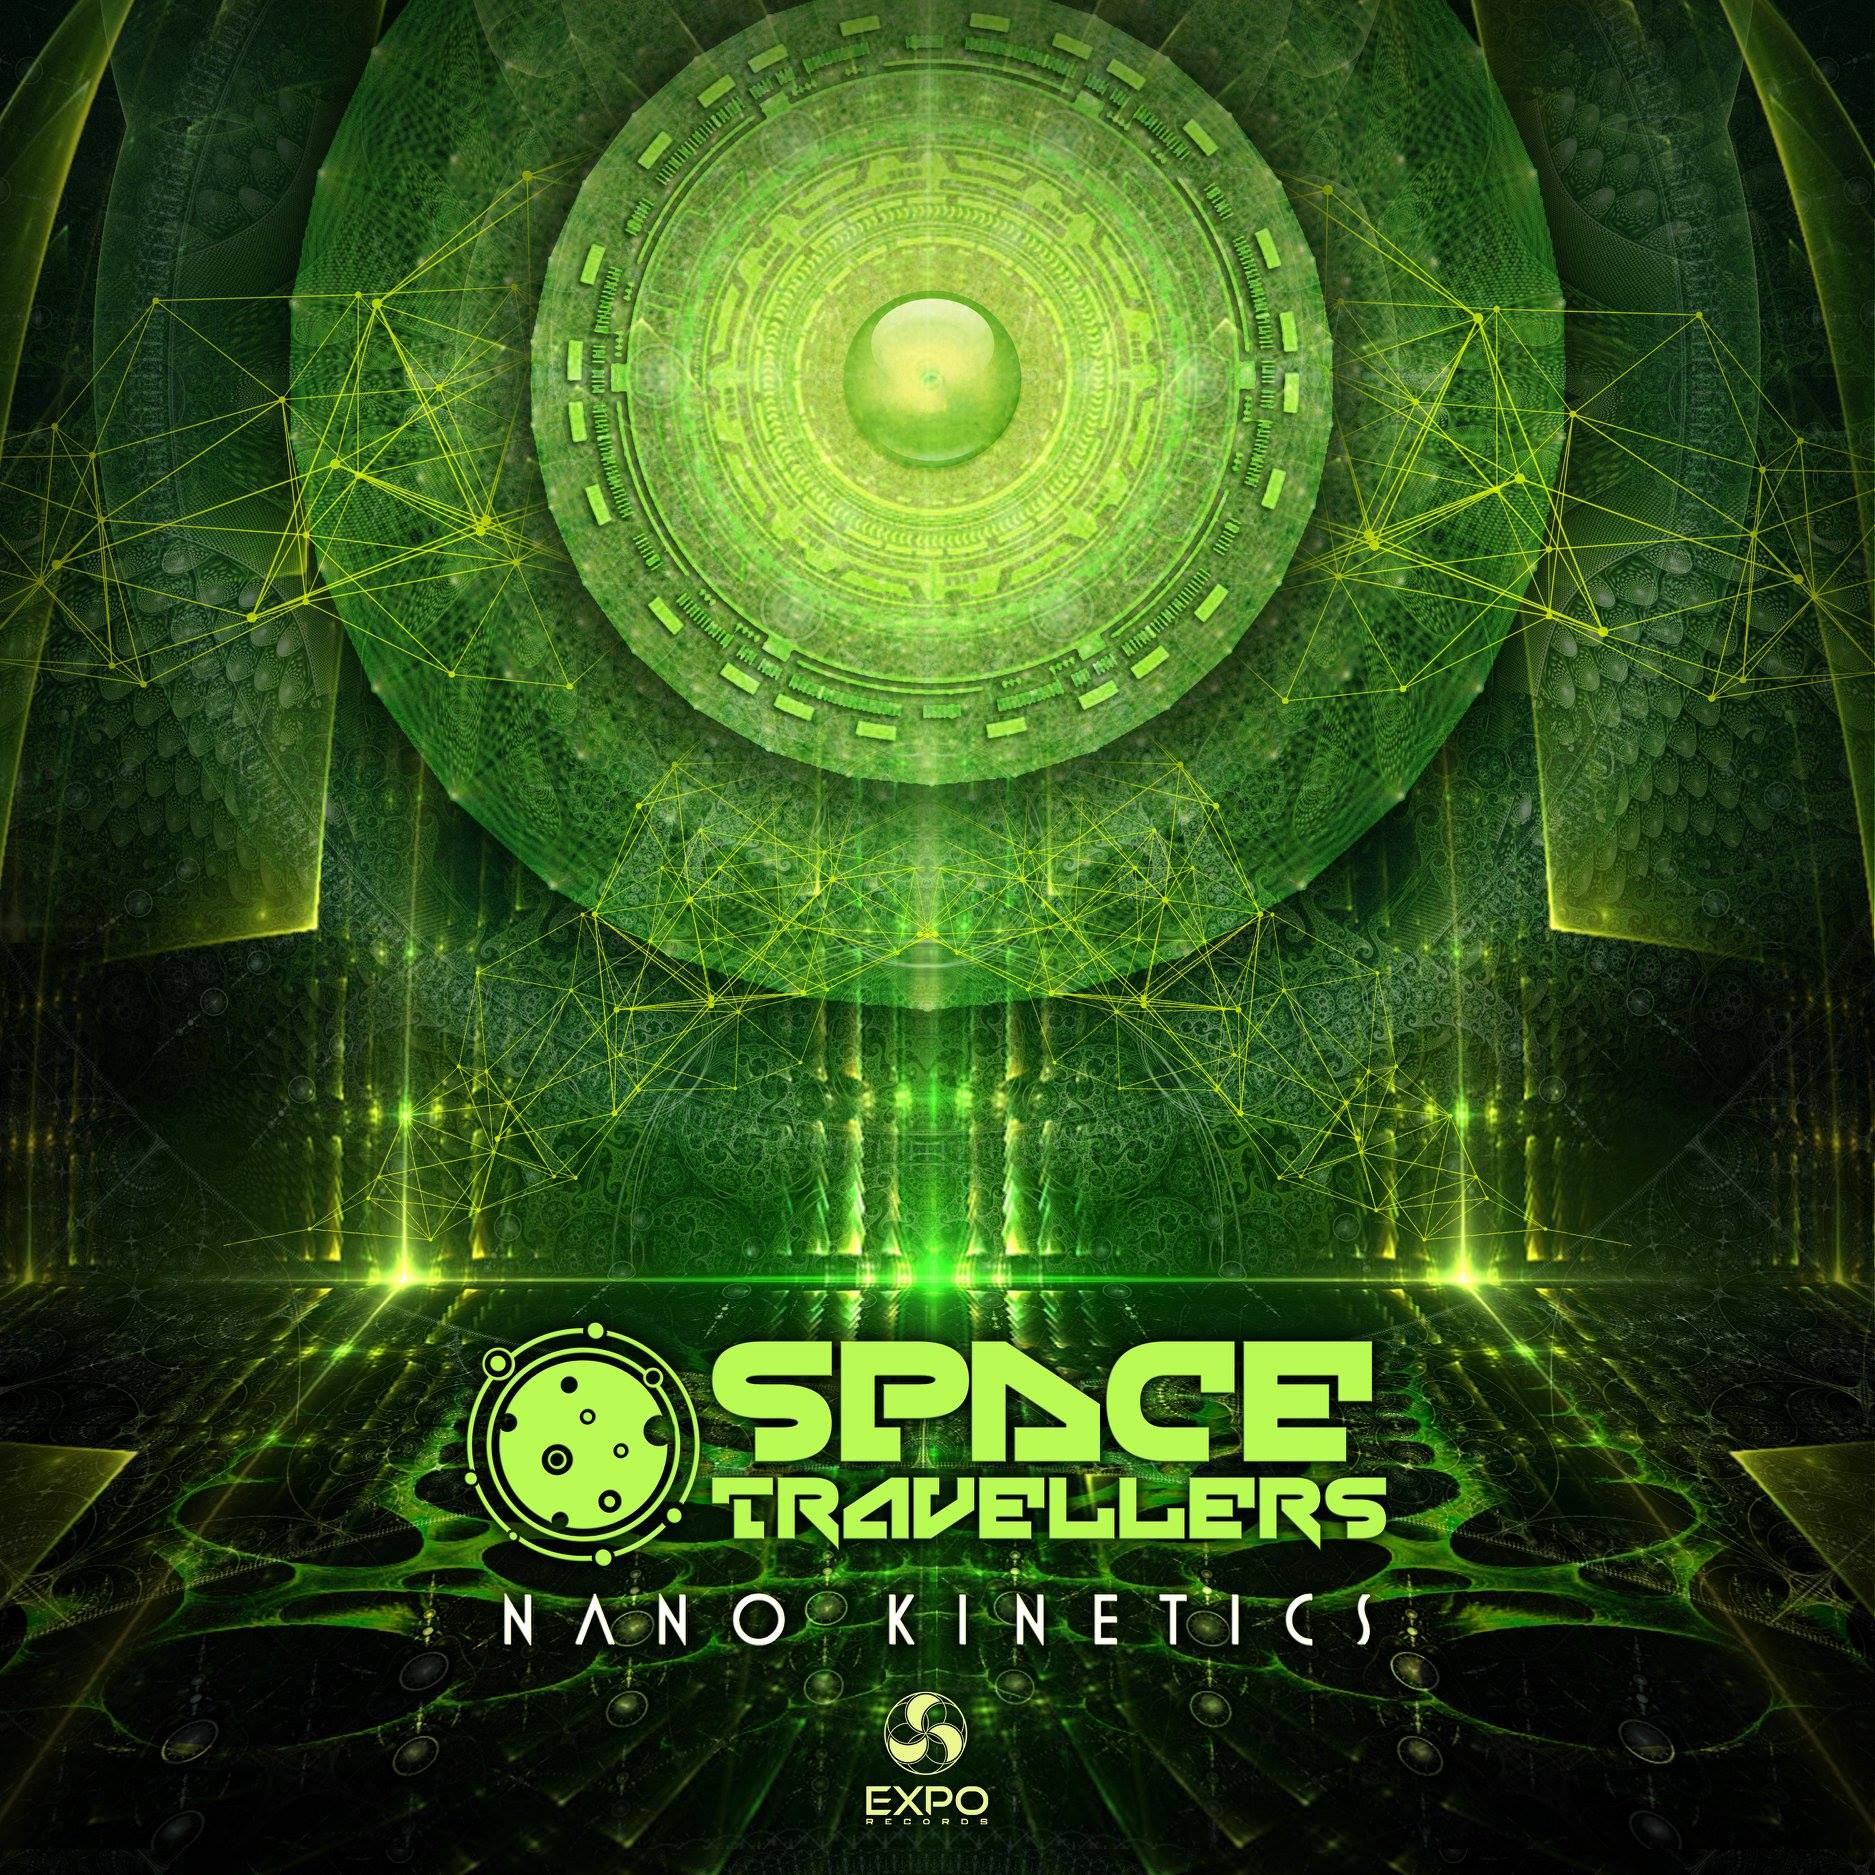 Space Travellers - Nano Kinetics